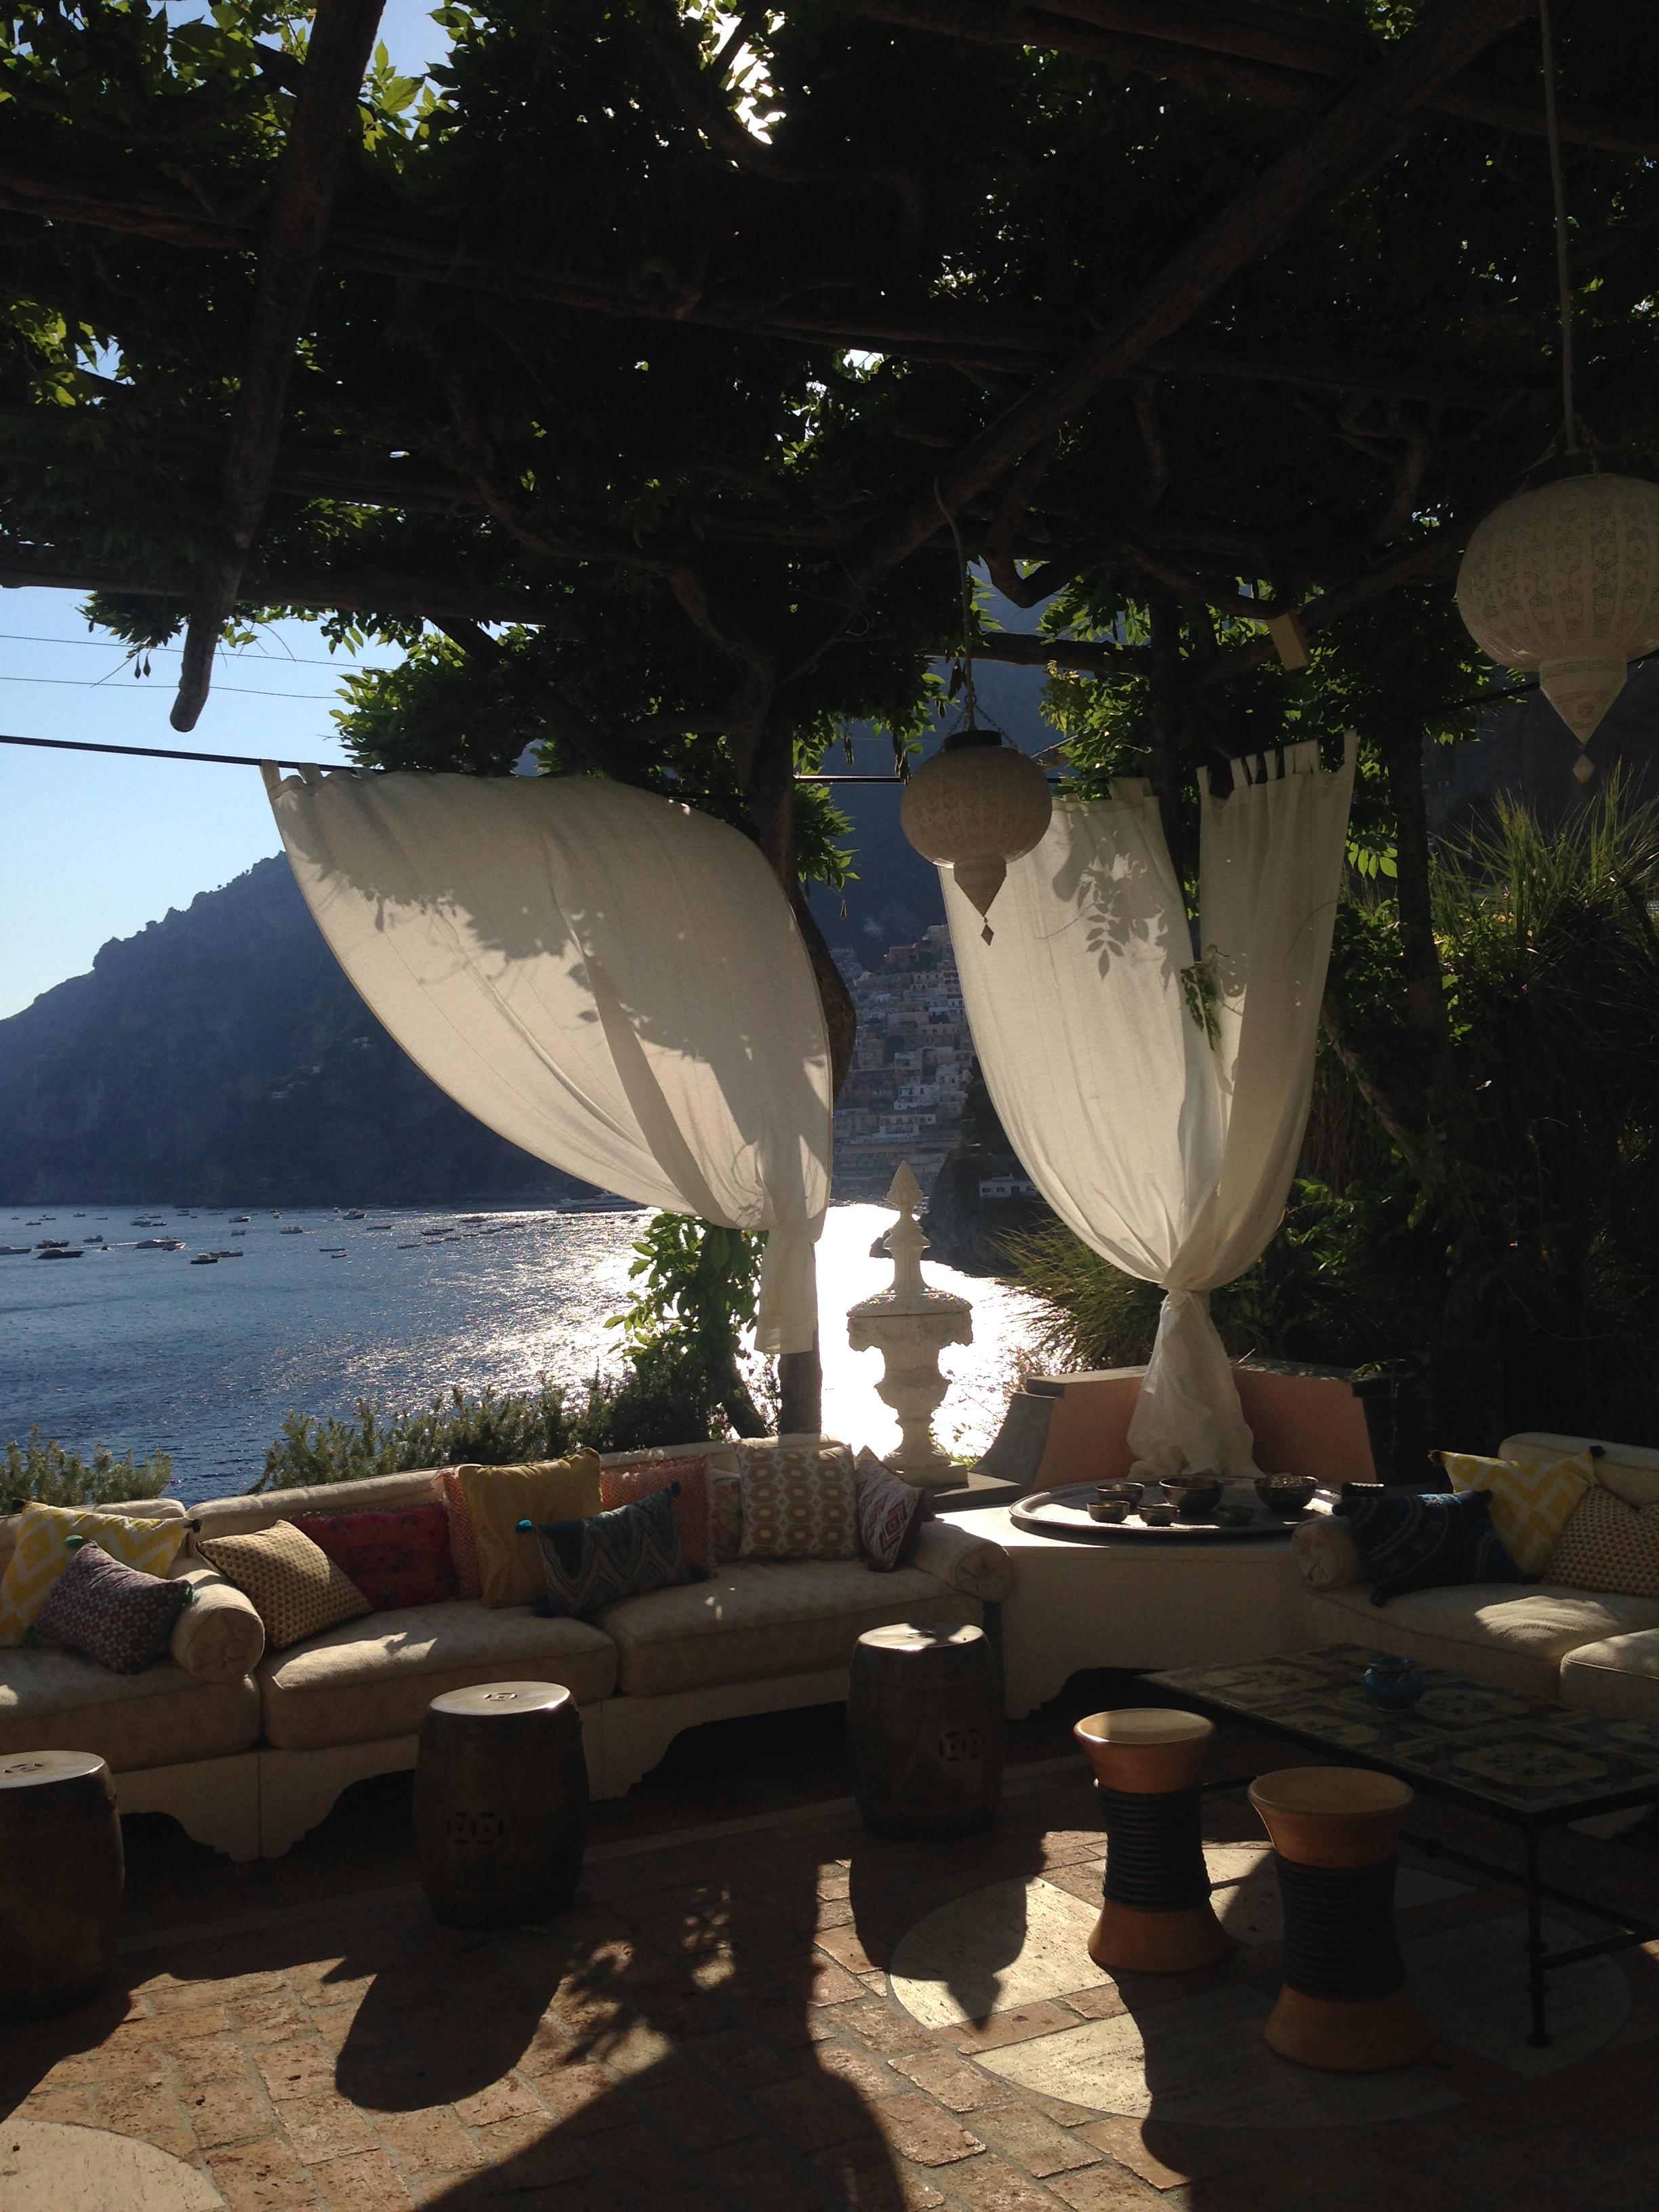 https://www.weddingamalfi.com/wp-content/uploads/Laura-and-Jarrod-amazing-wedding-location-in-Positano.jpg